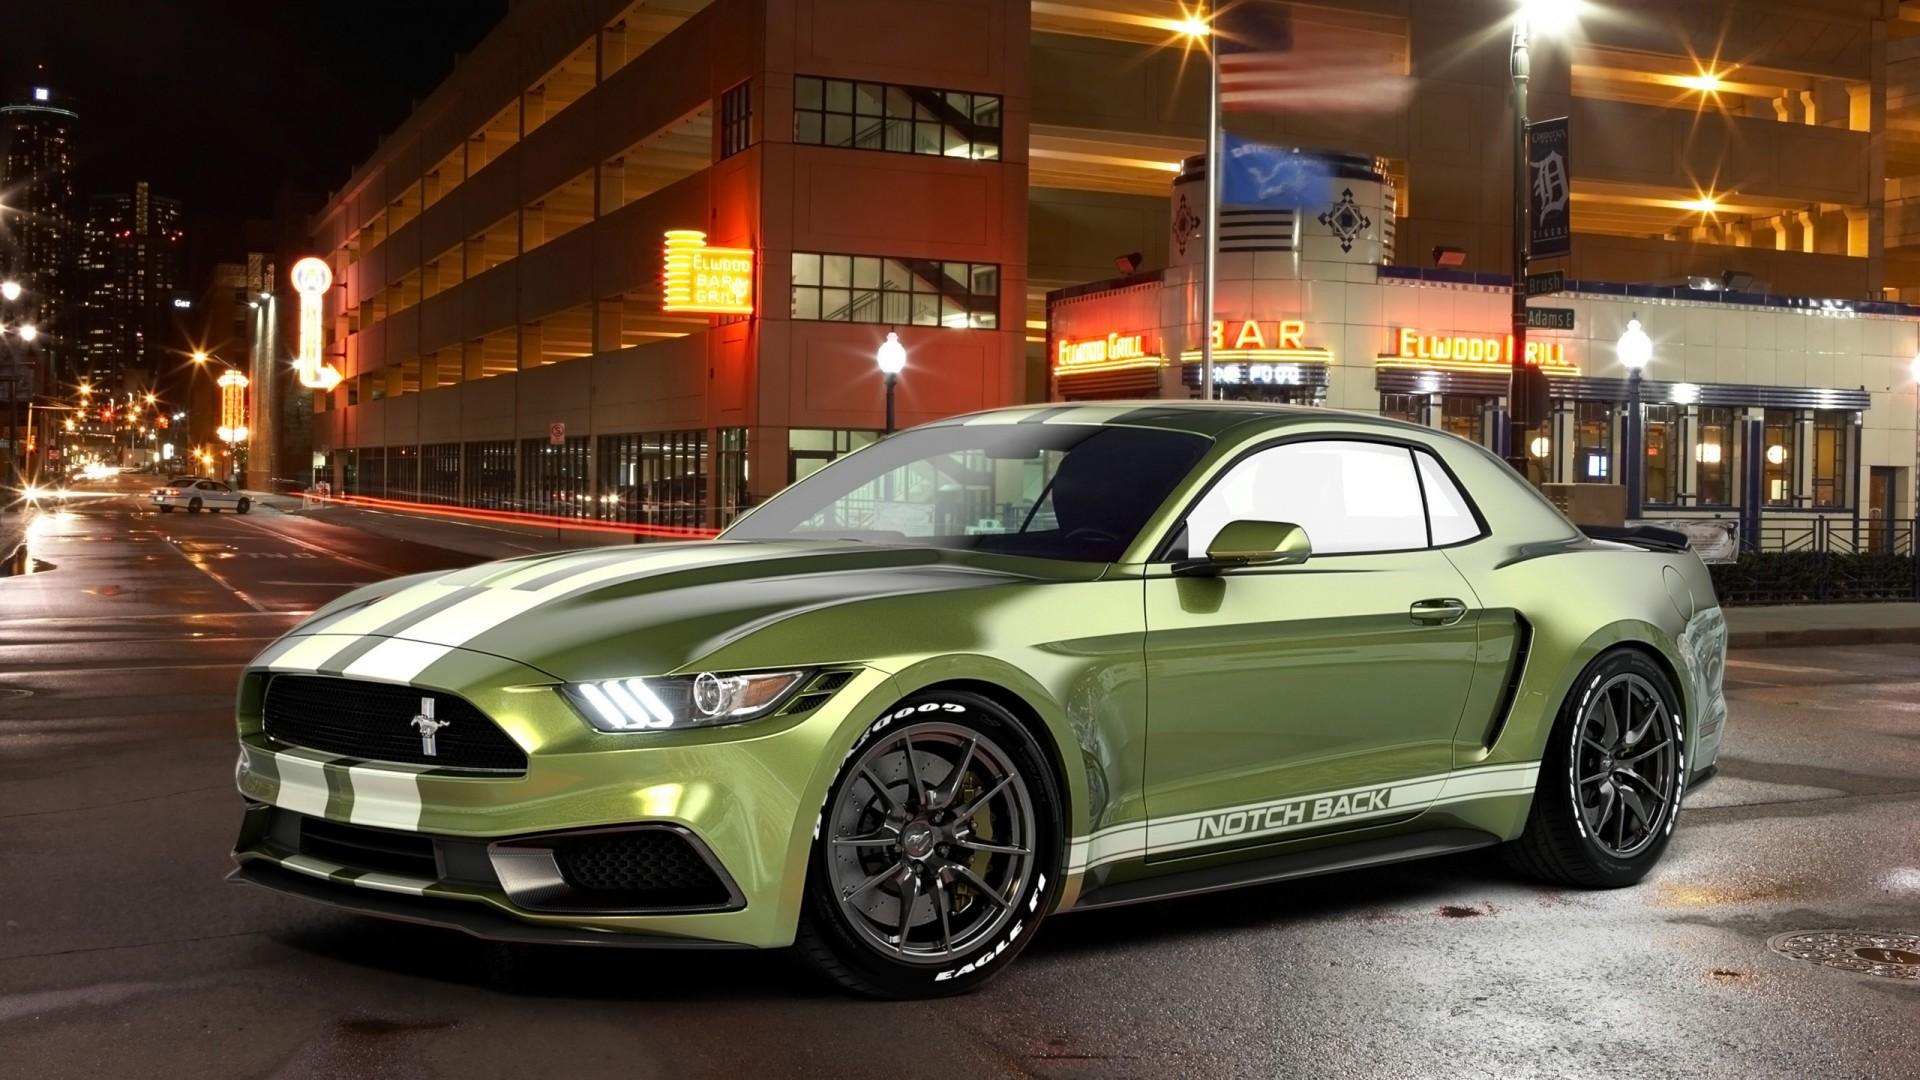 Mustang Car Wallpaper Desktop 2017 Ford Mustang Notchback Design 3 Wallpaper Hd Car